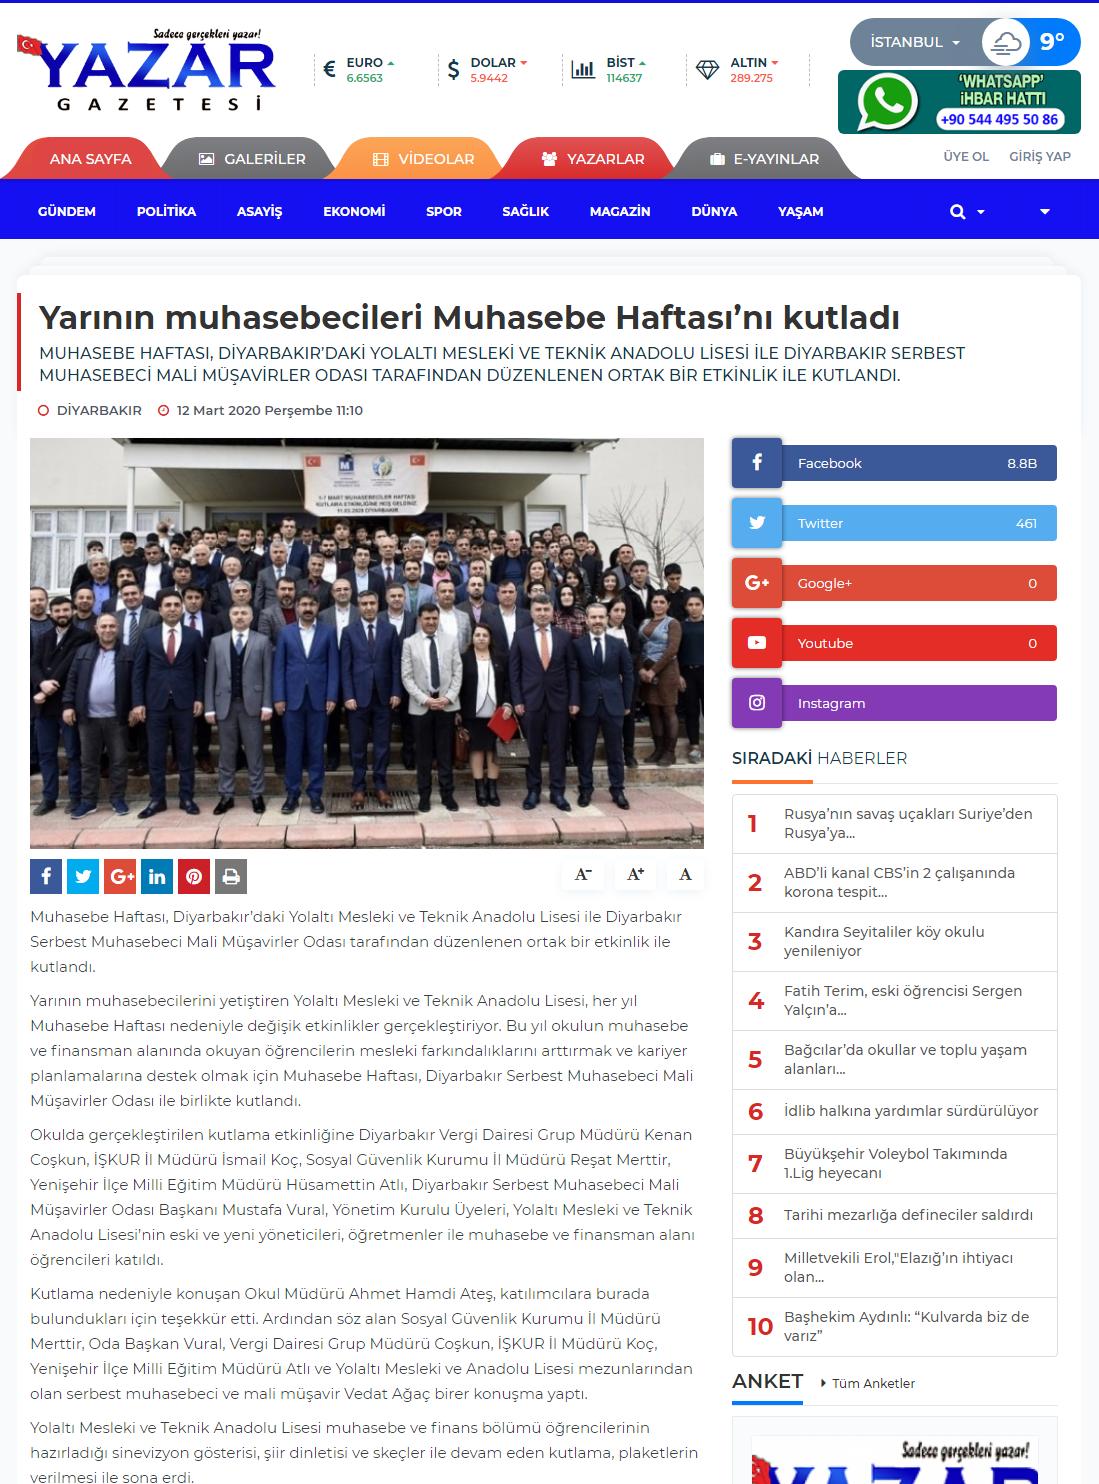 YARININ MUHASEBECİLERİ MUHASEBE HAFTASINI KUTLADI (yazargazetesi.com)